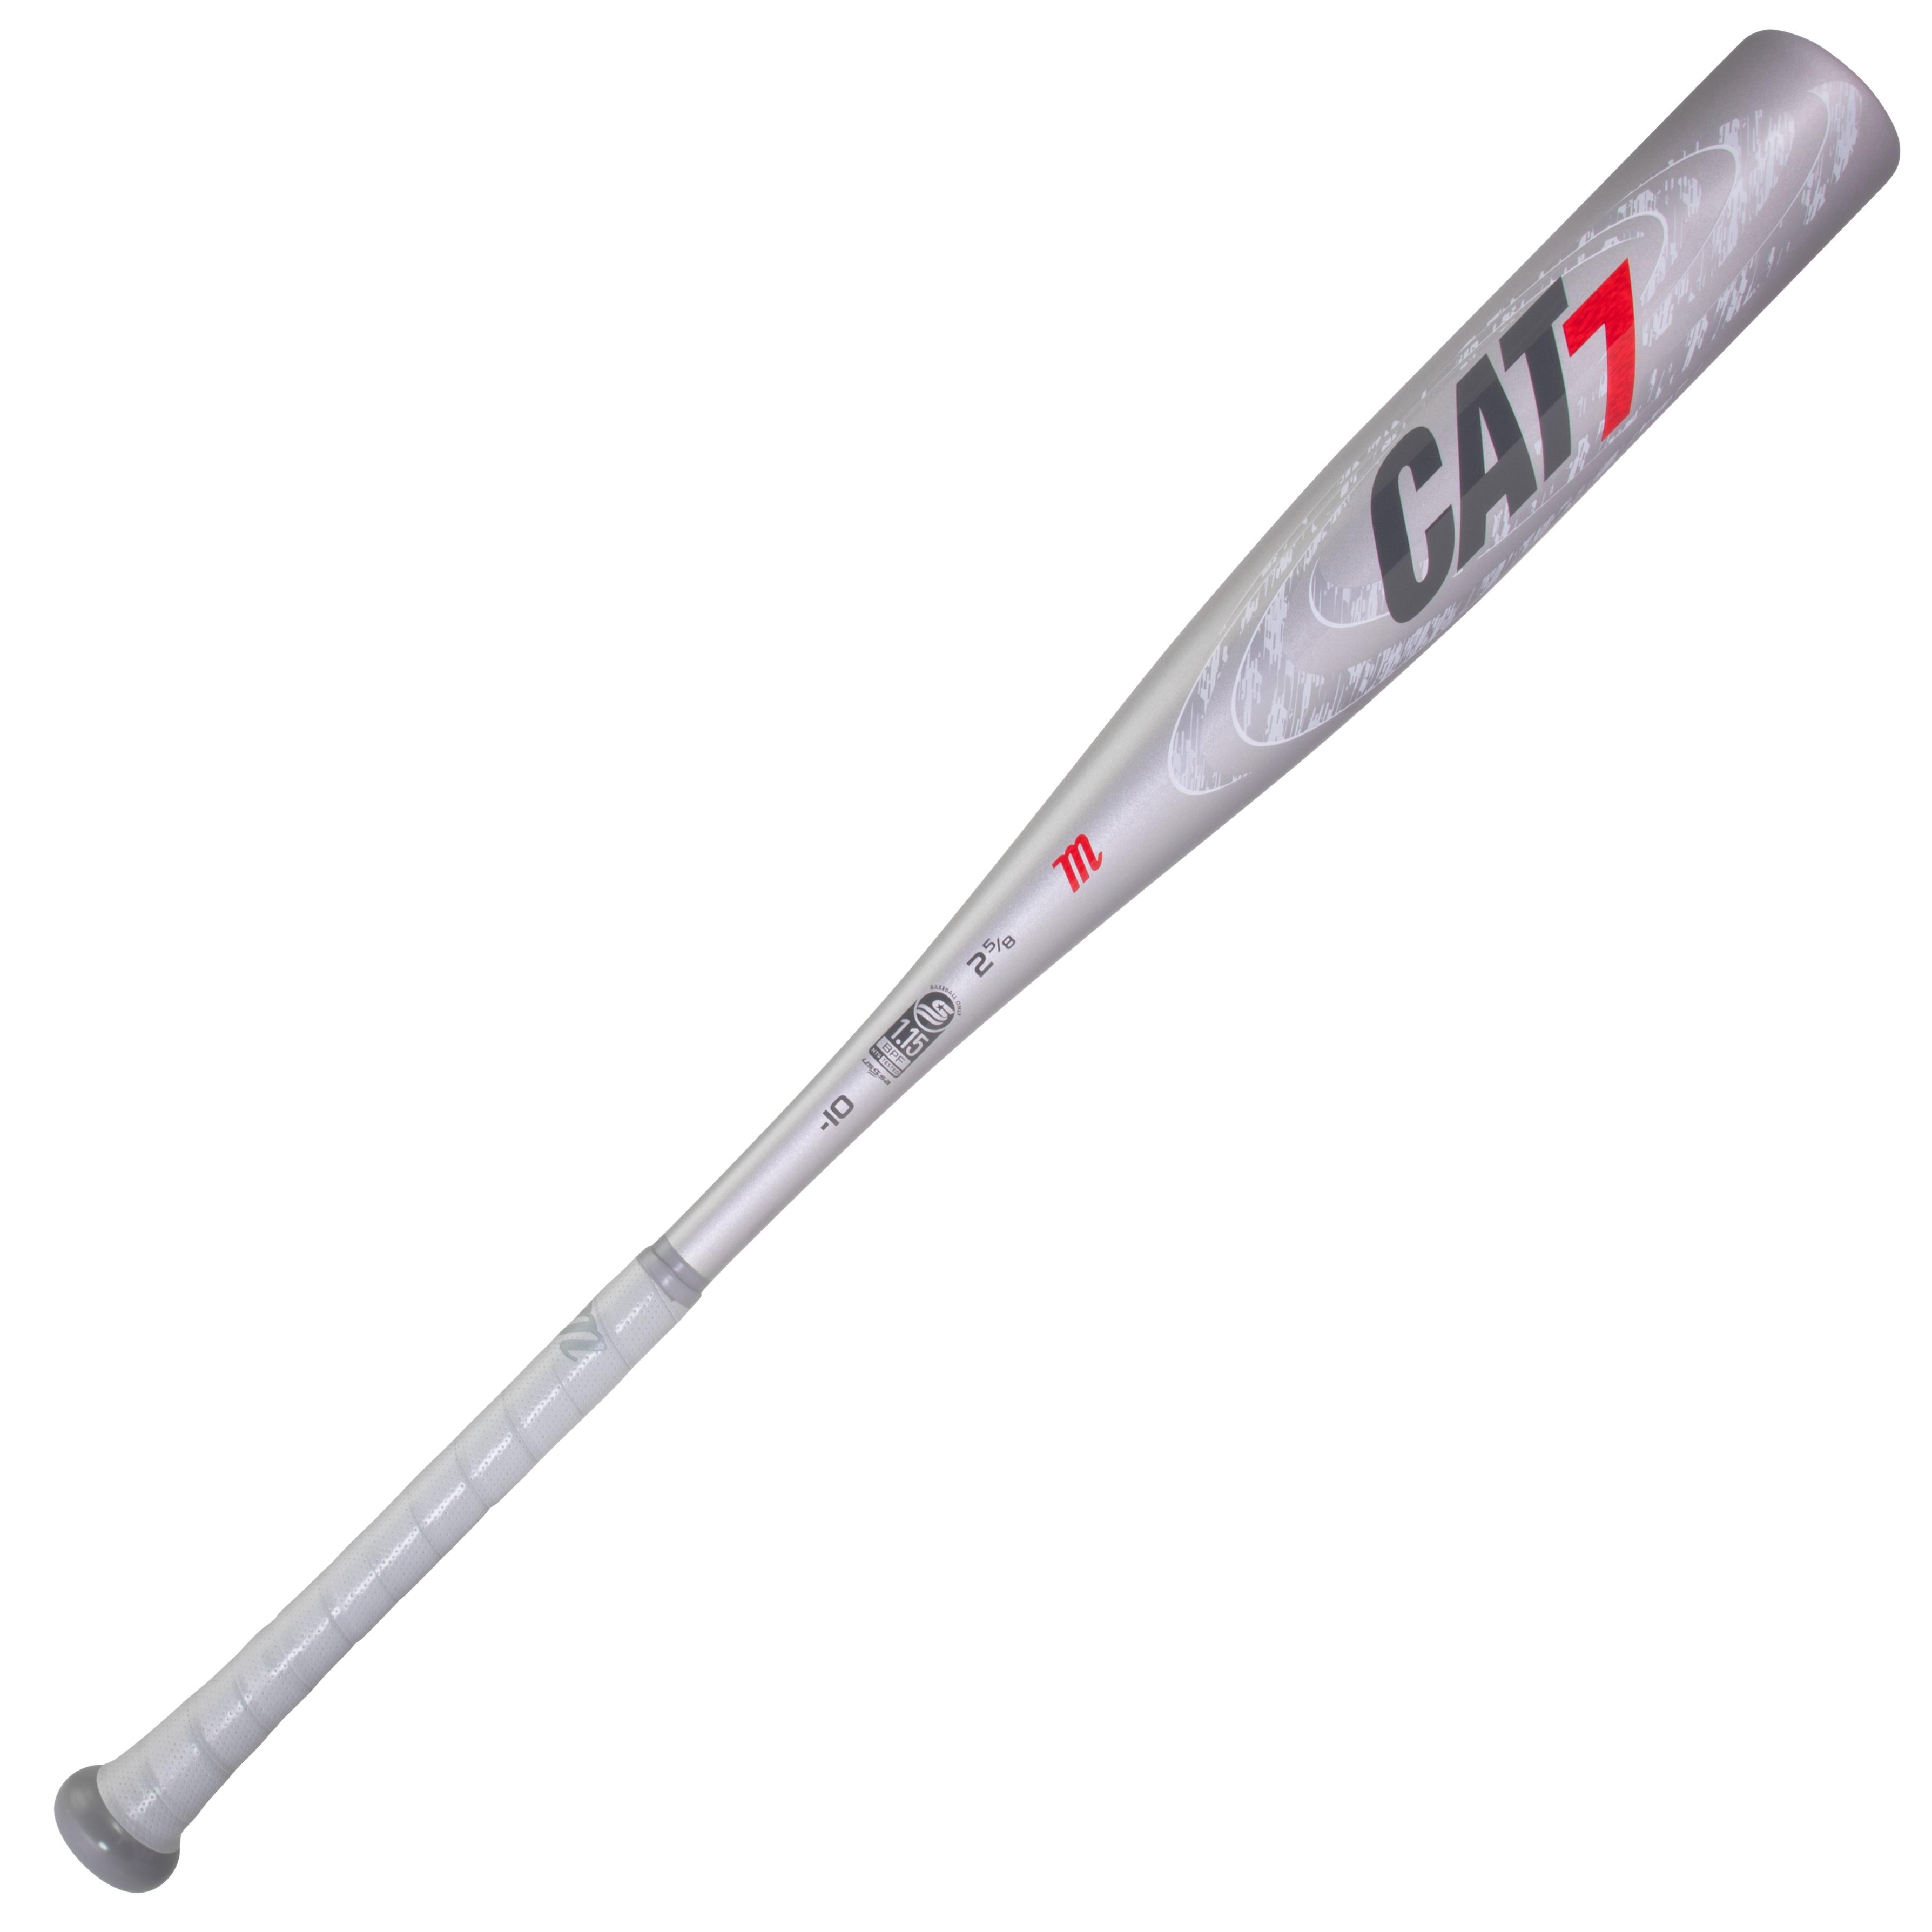 marucci-cat7-silver-10-baseball-bat-28-inch-18-oz MSBC7210S-2820